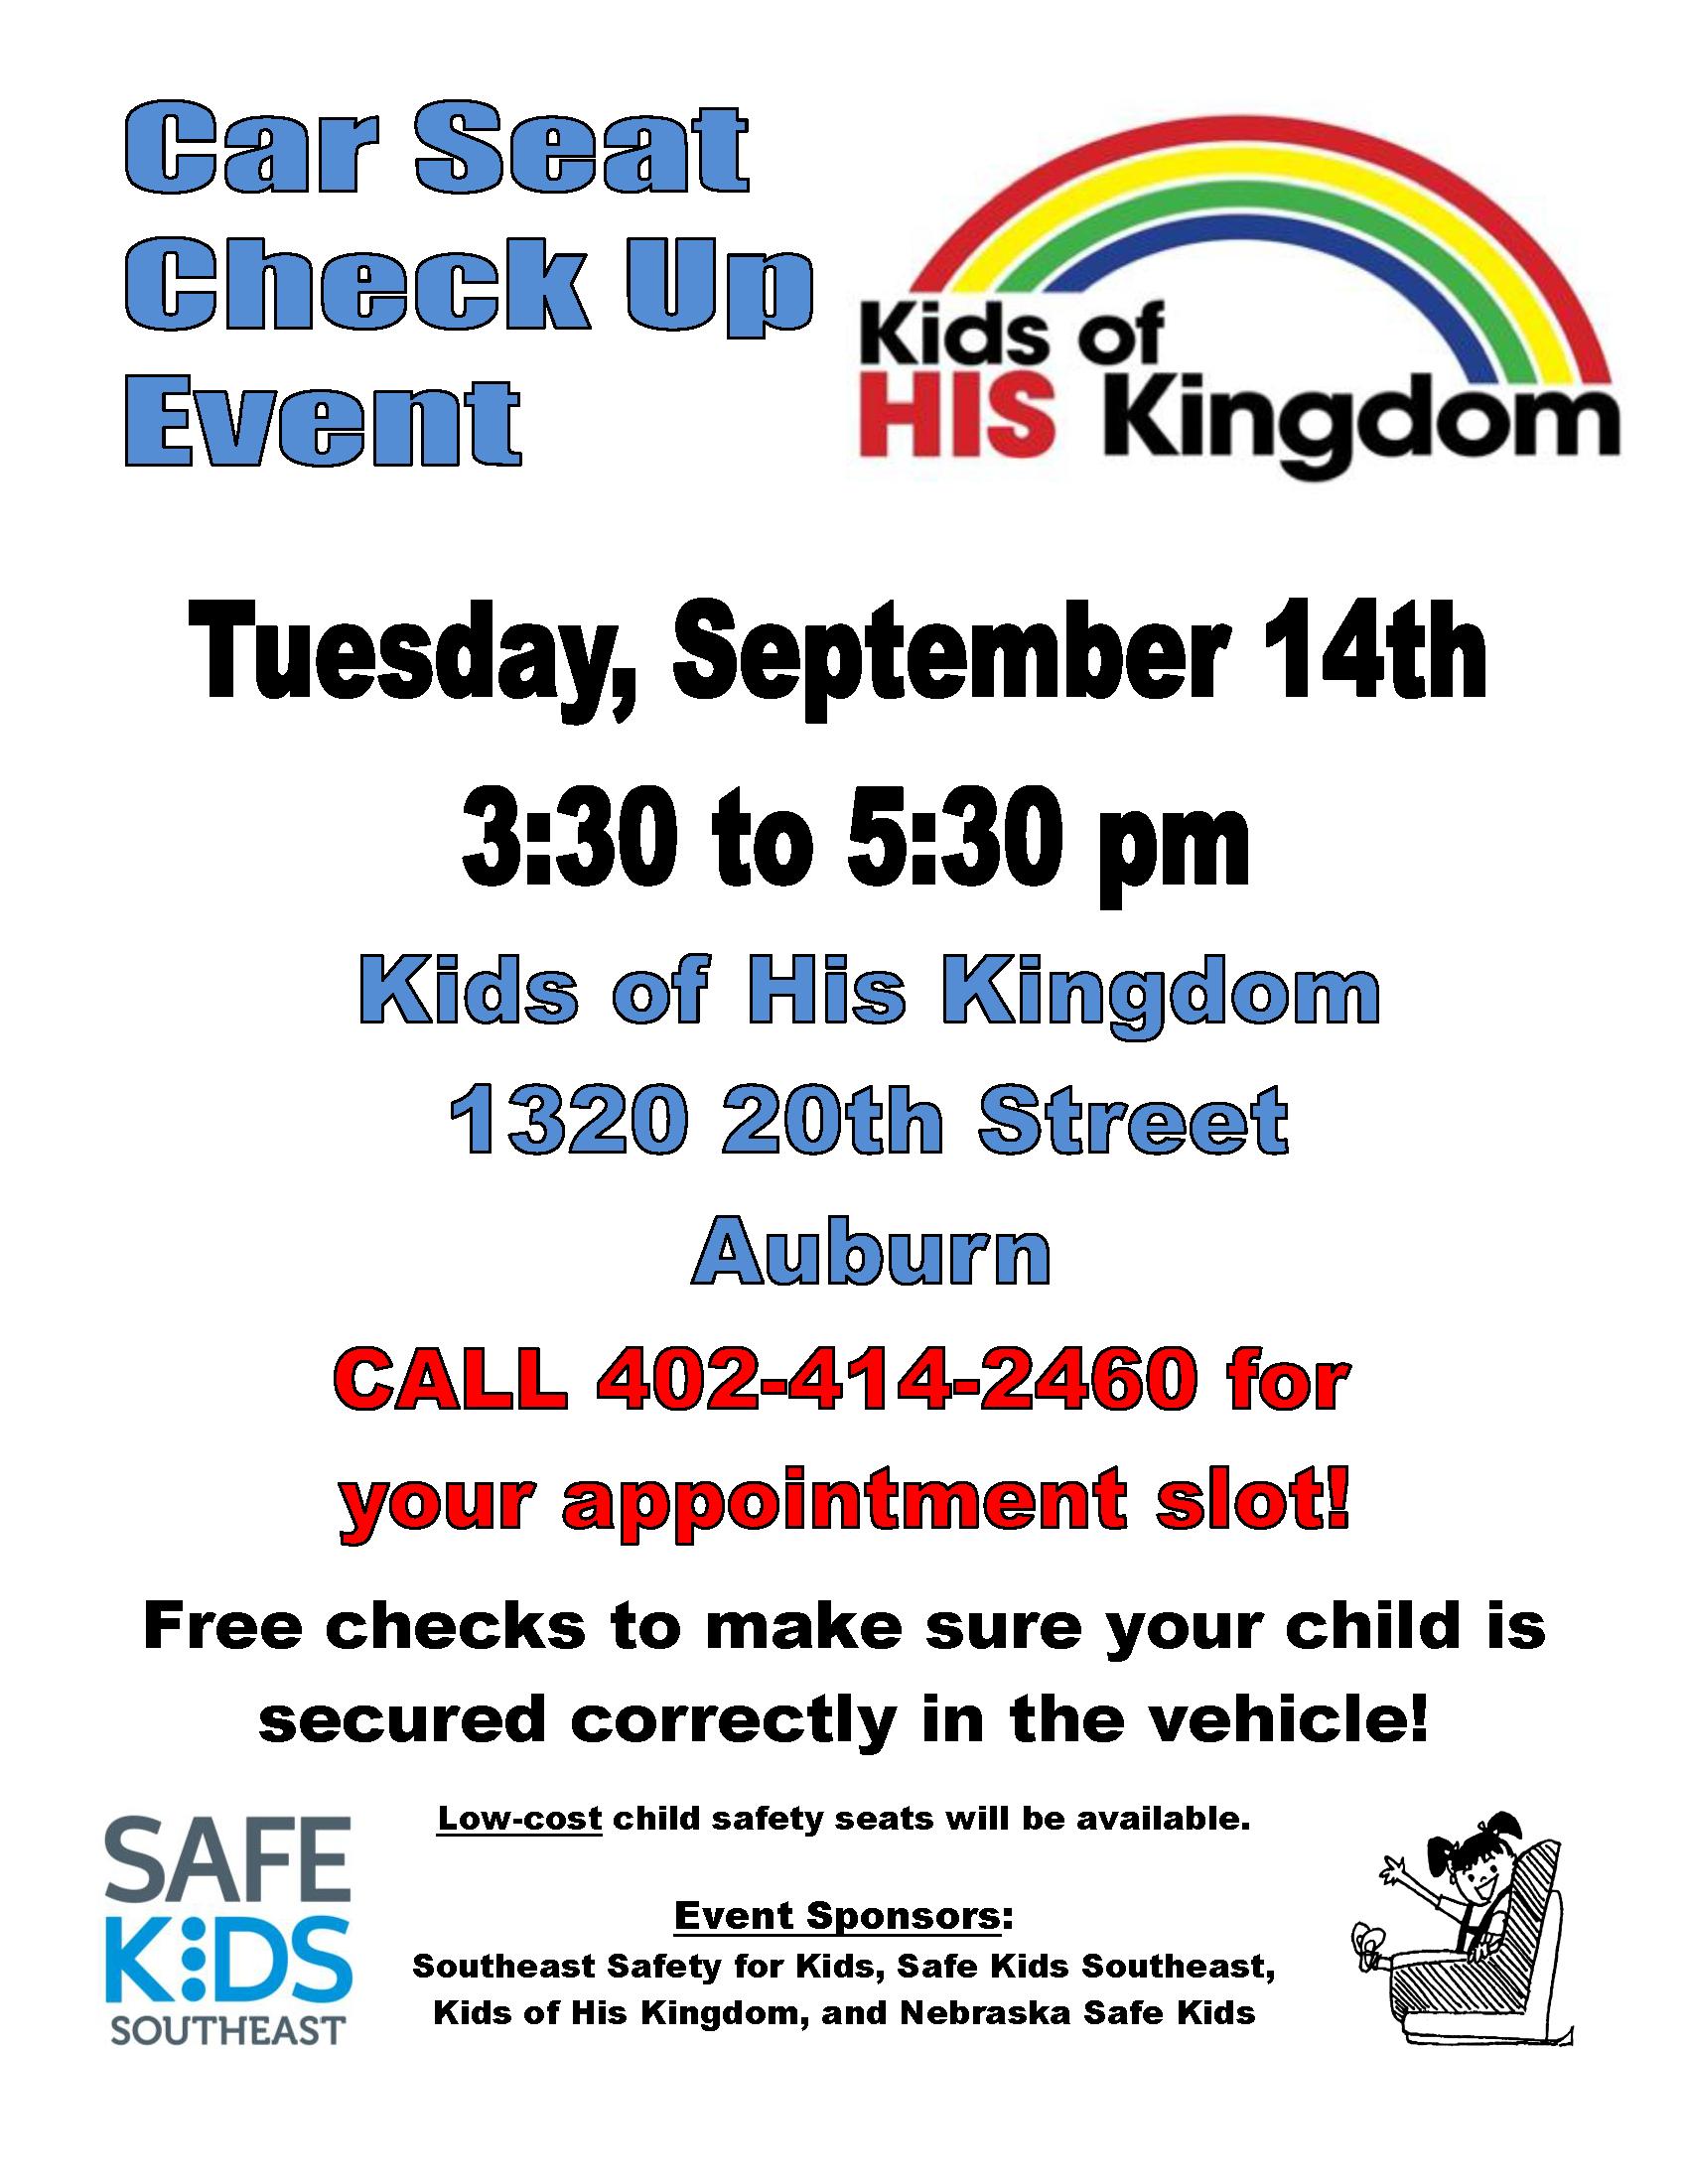 Kids of His Kingdom Childcare Center